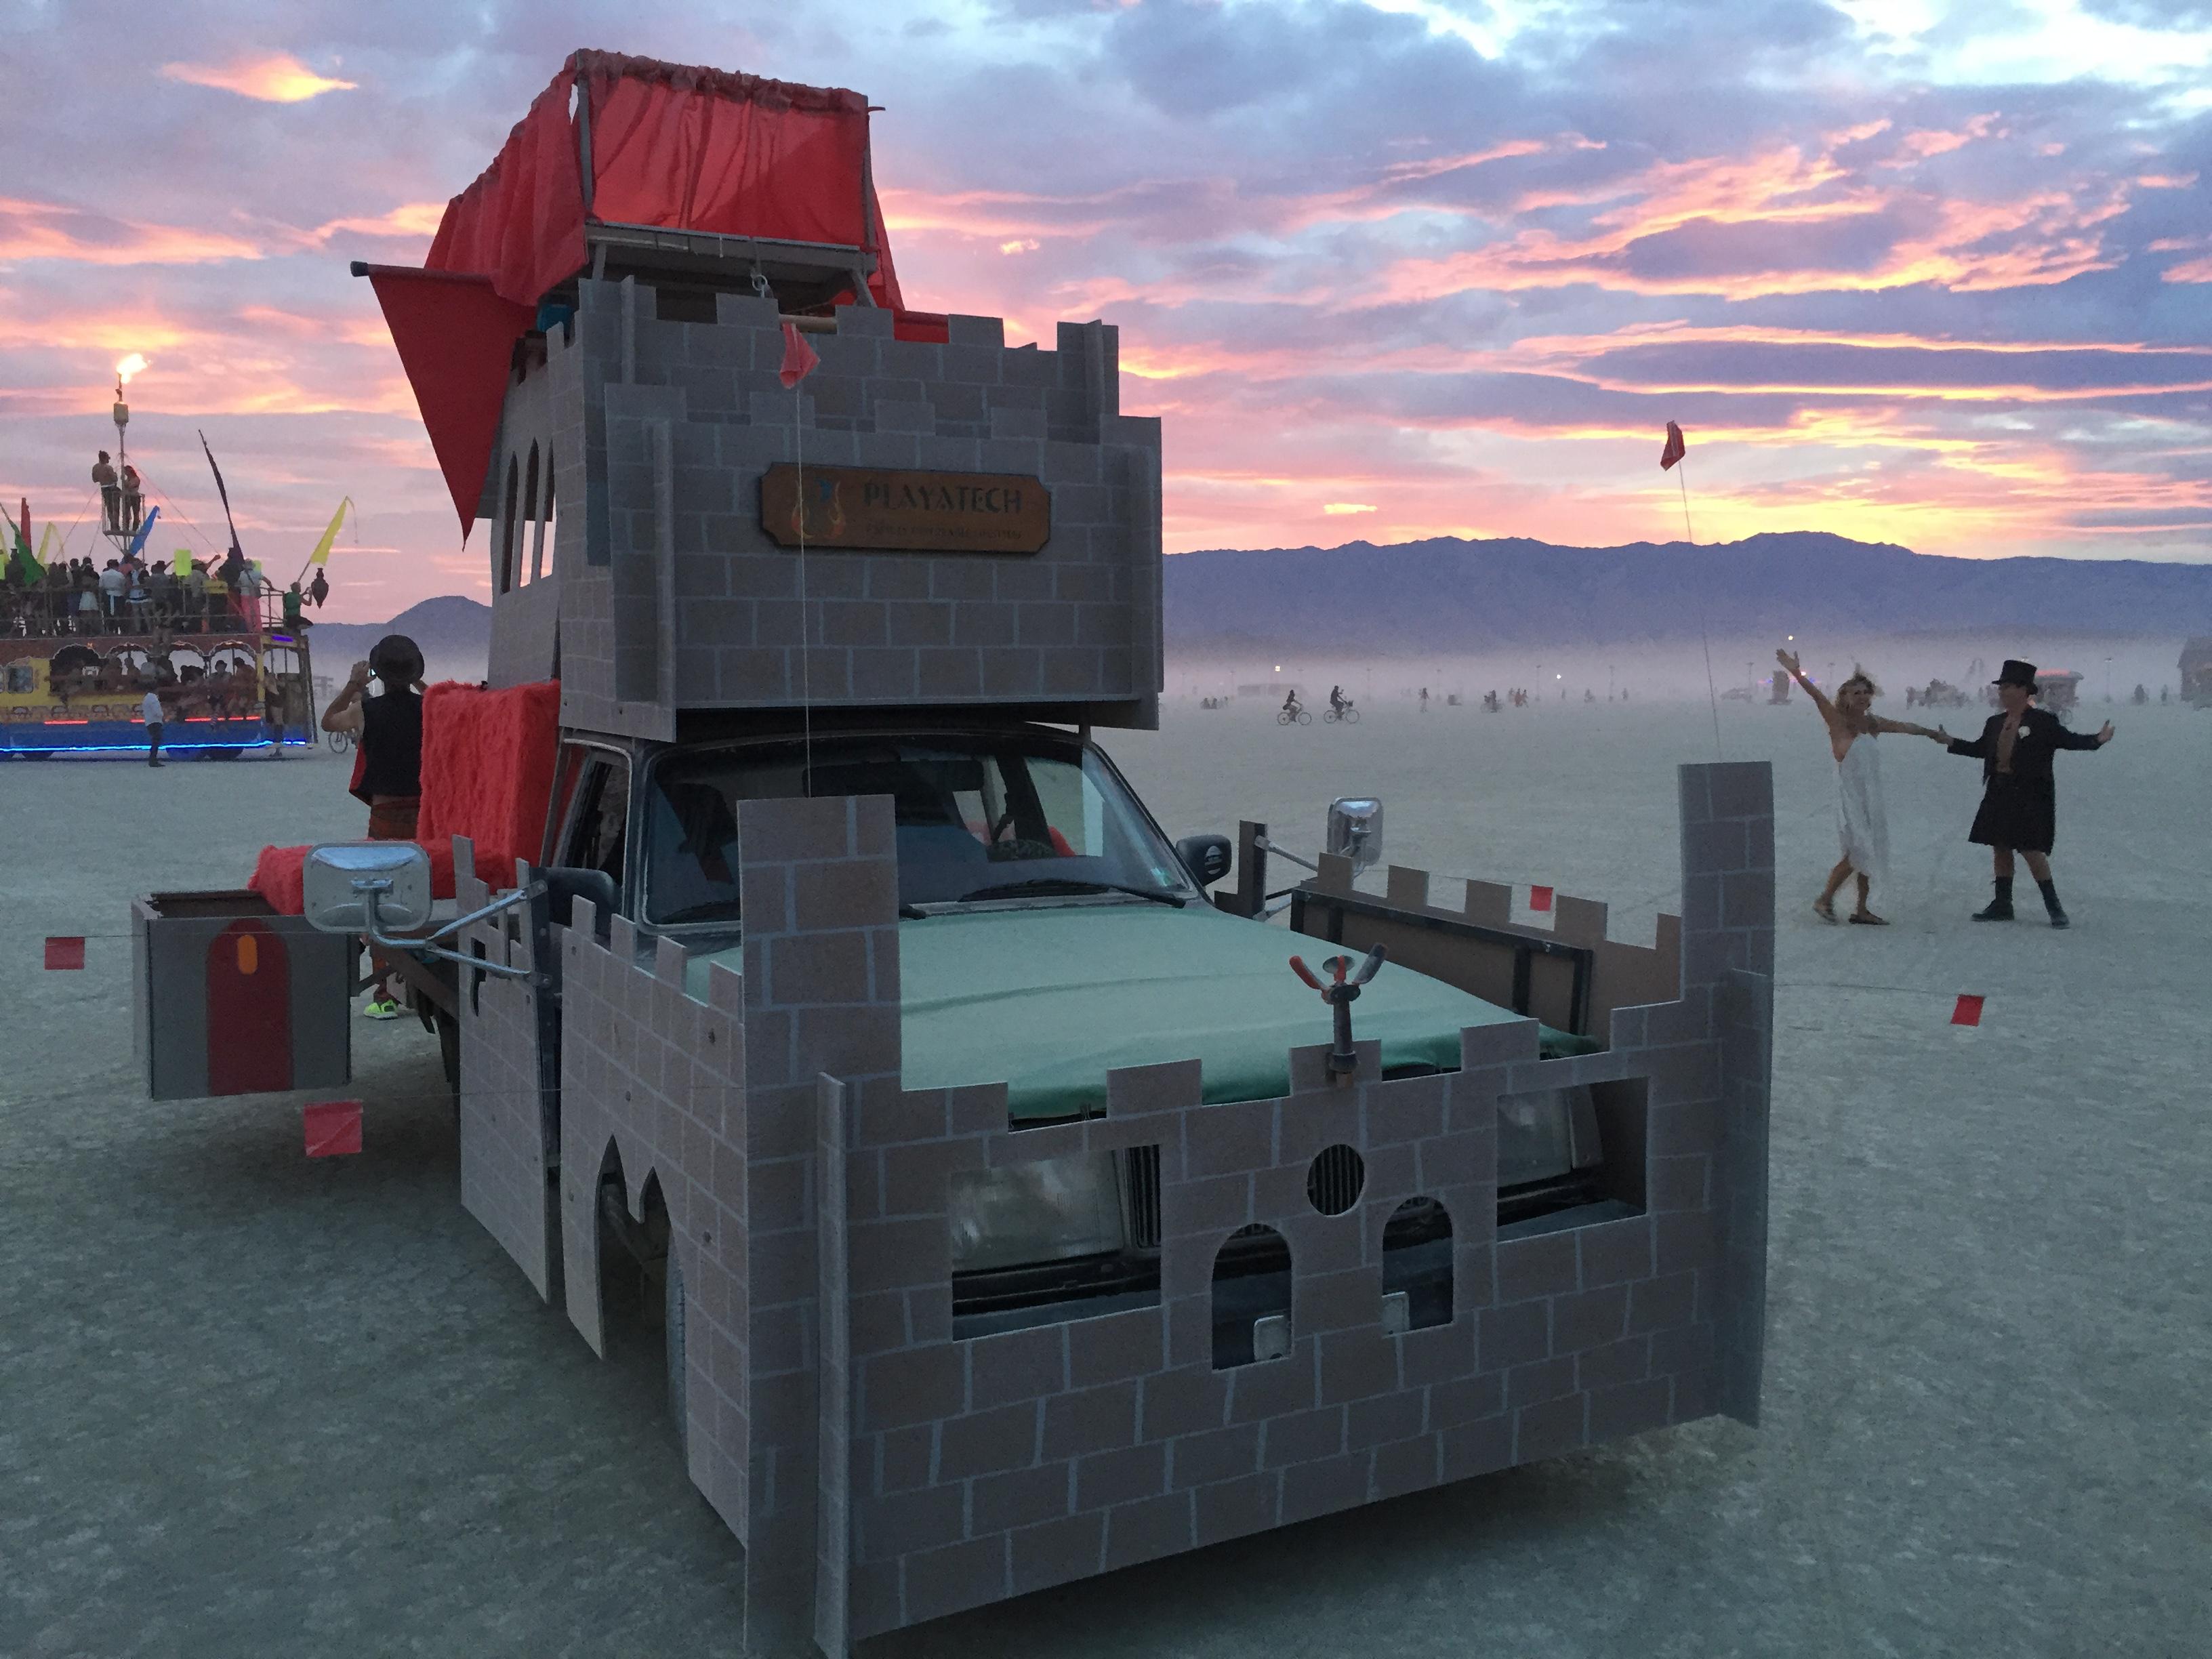 Flaming Castle Does Sunset Wedding